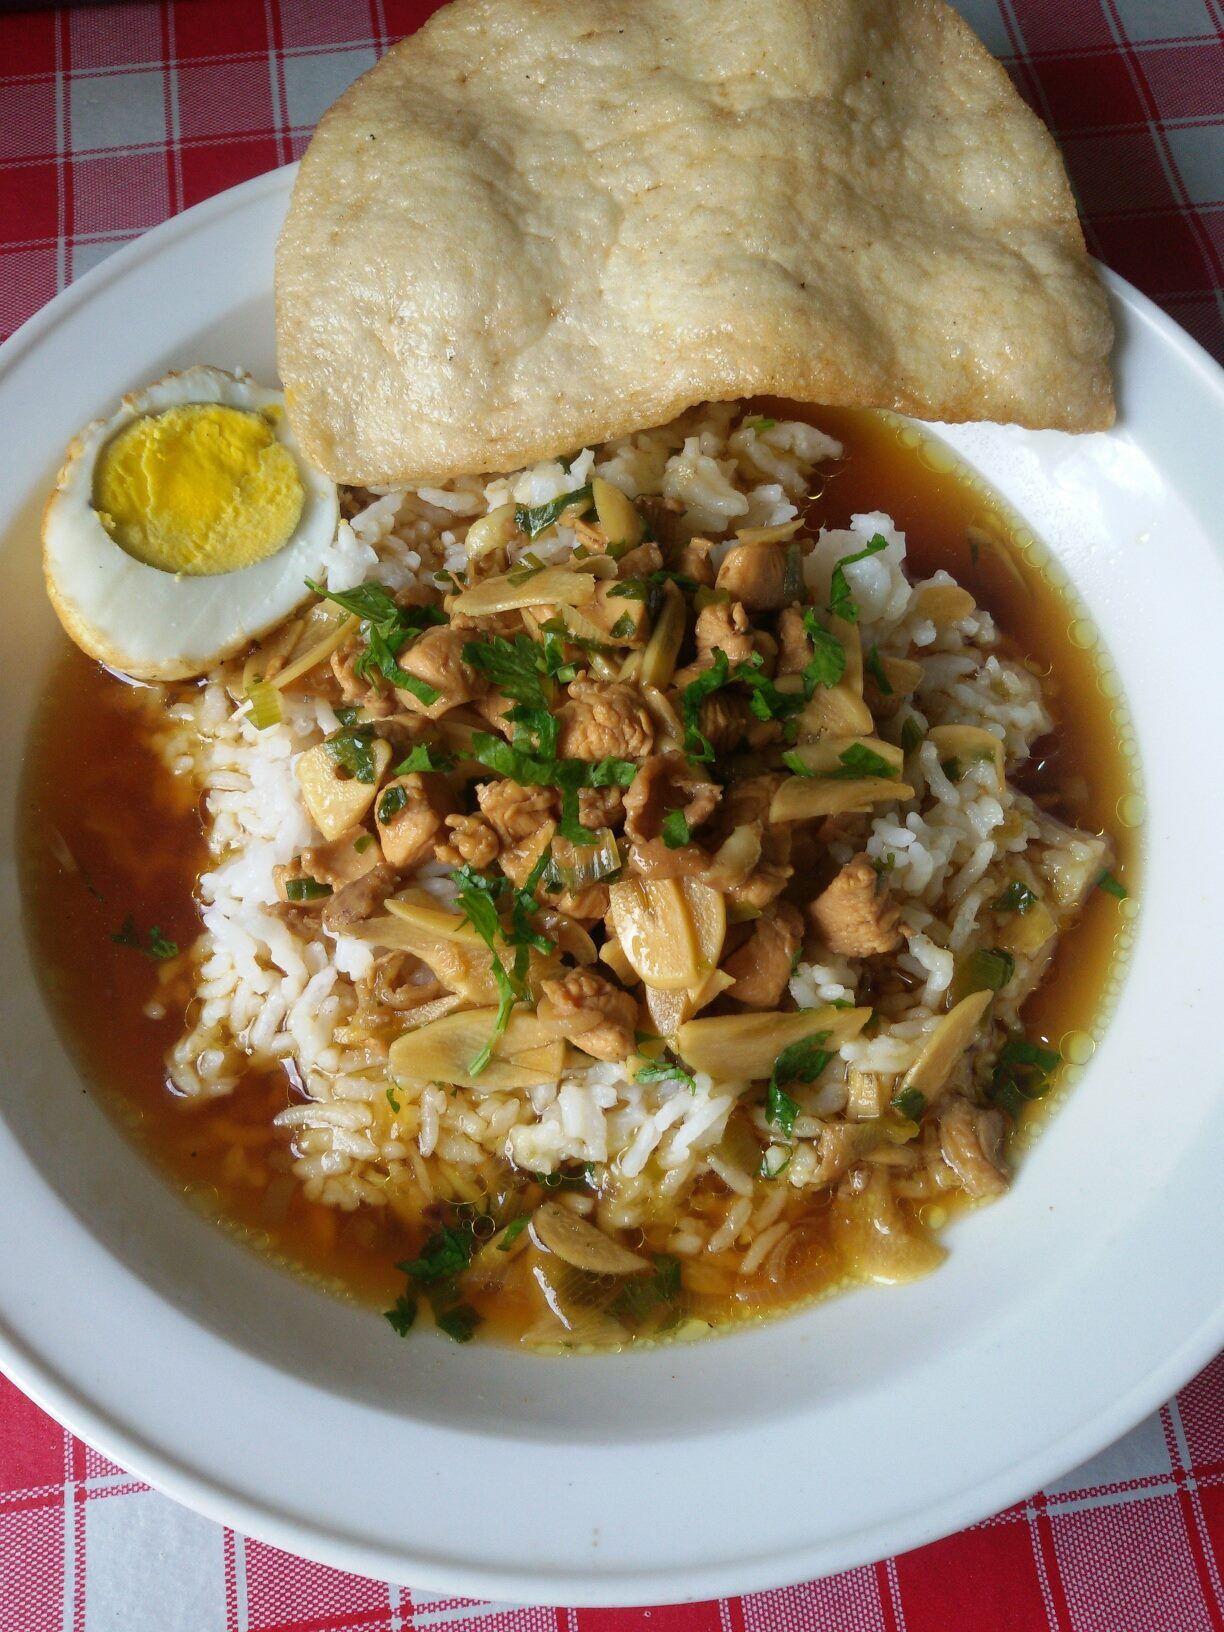 Bakmoy Ayam Surabaya Makanan Dan Minuman Masakan Resep Masakan